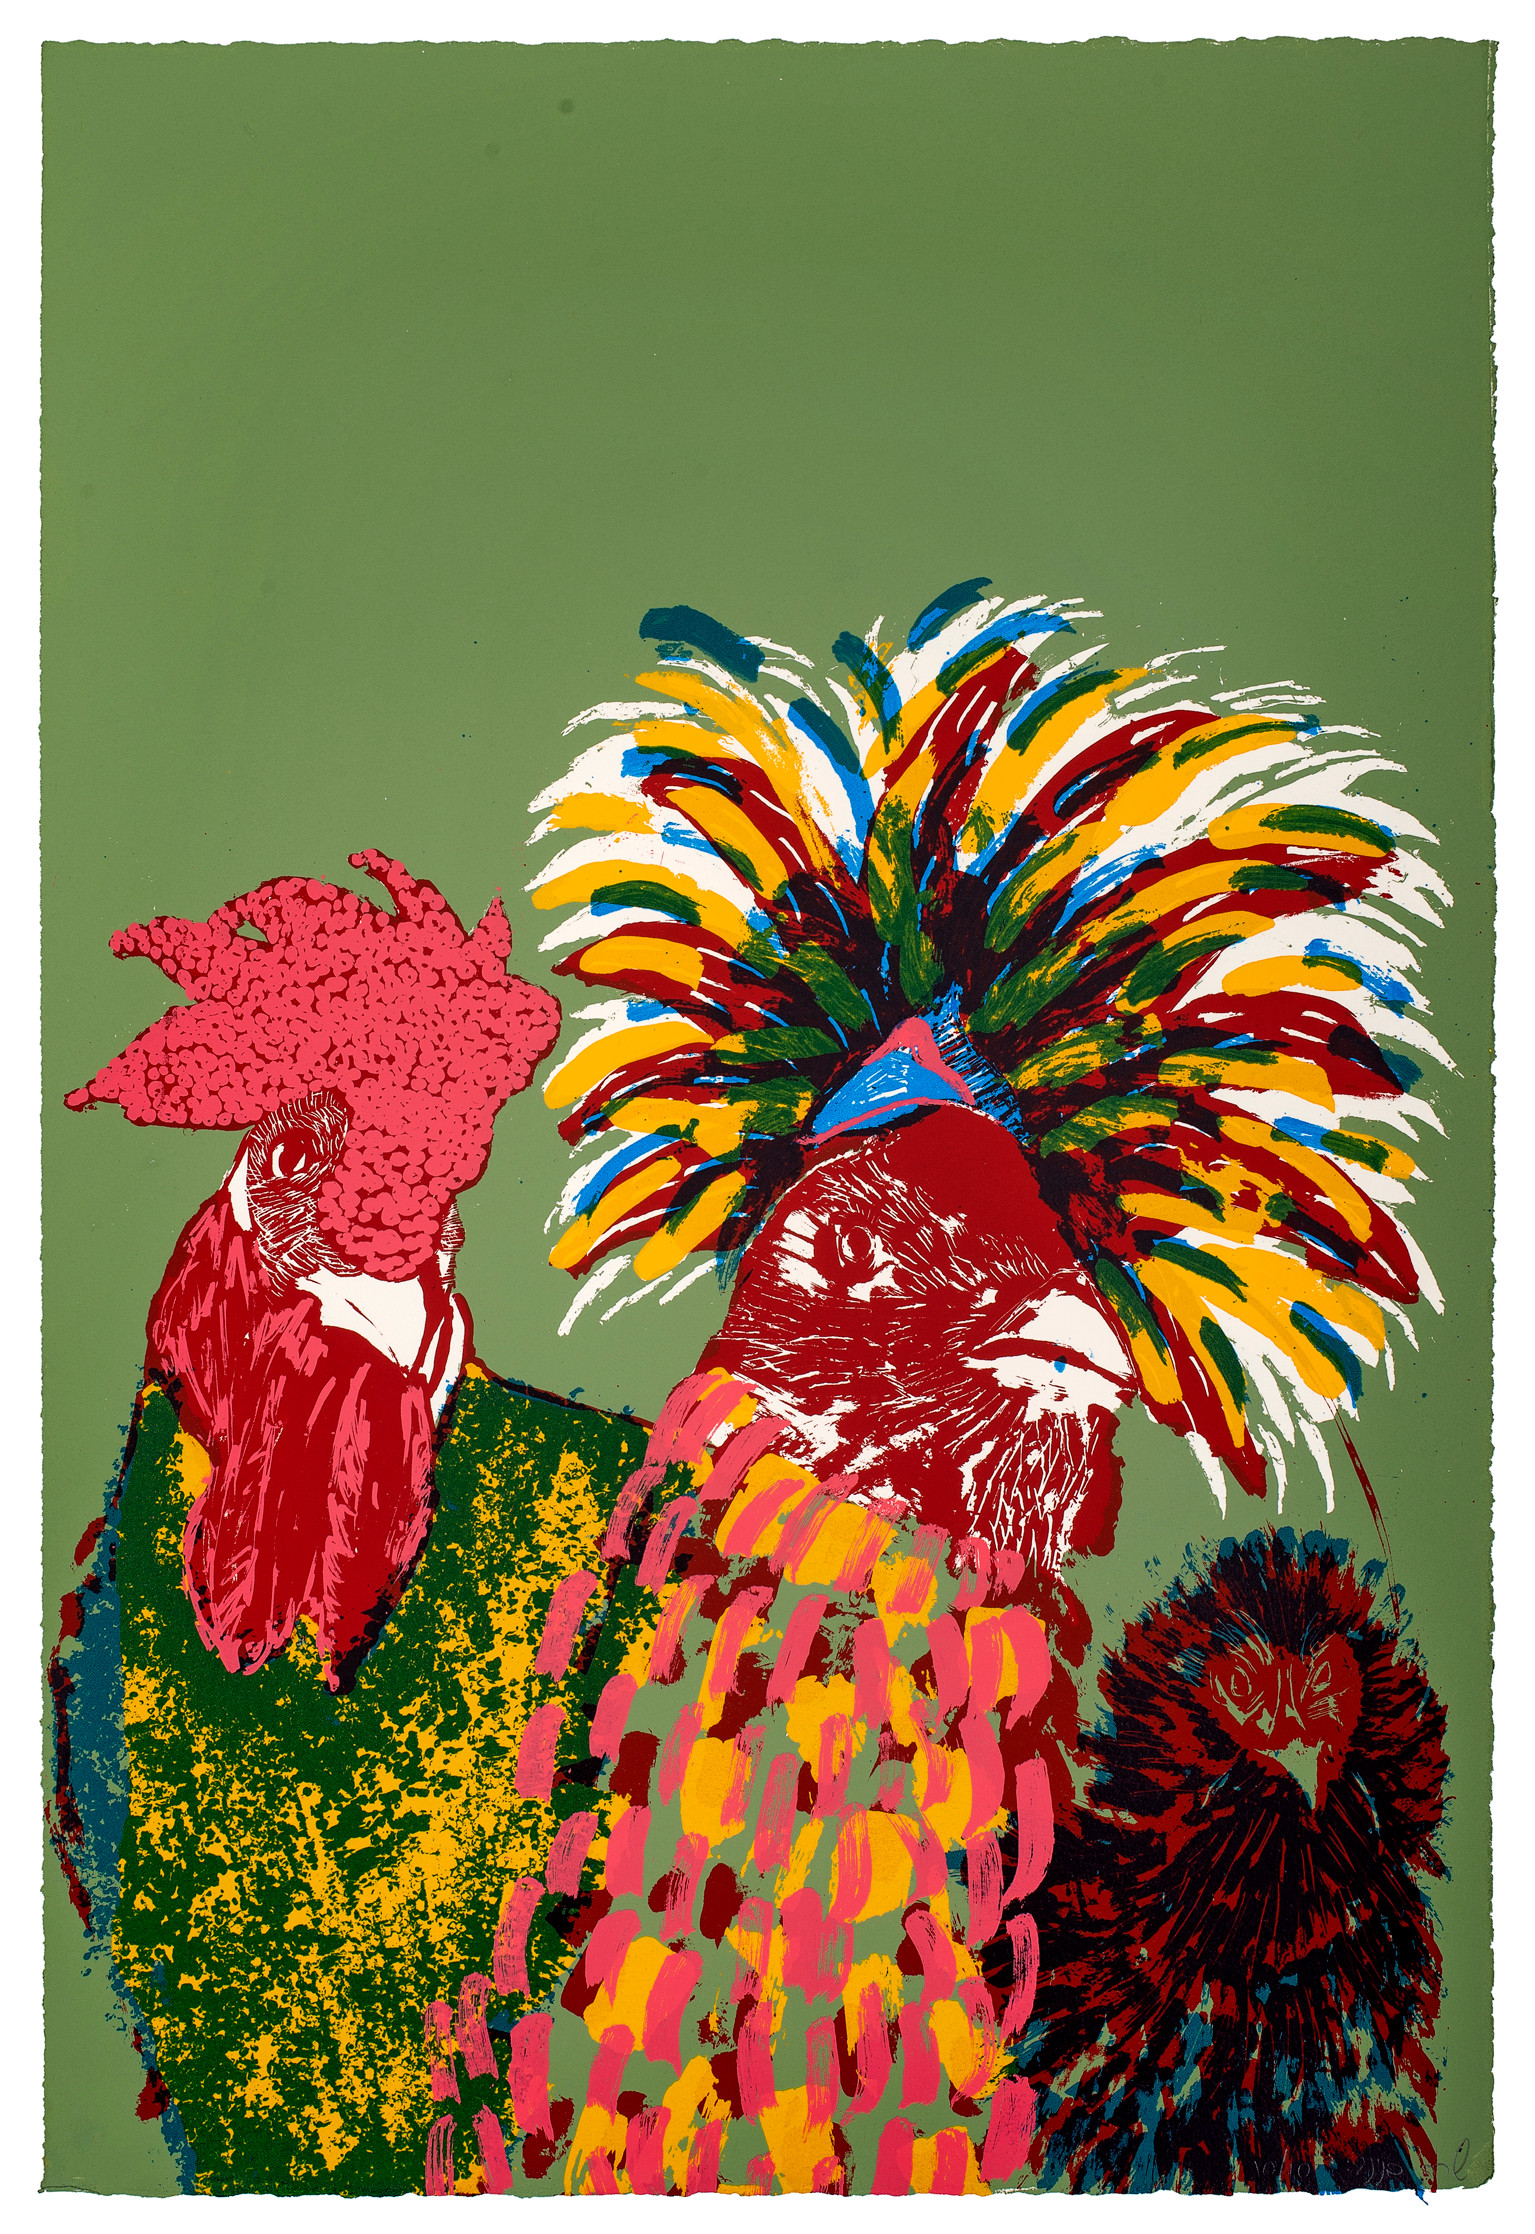 Kooky Chickens